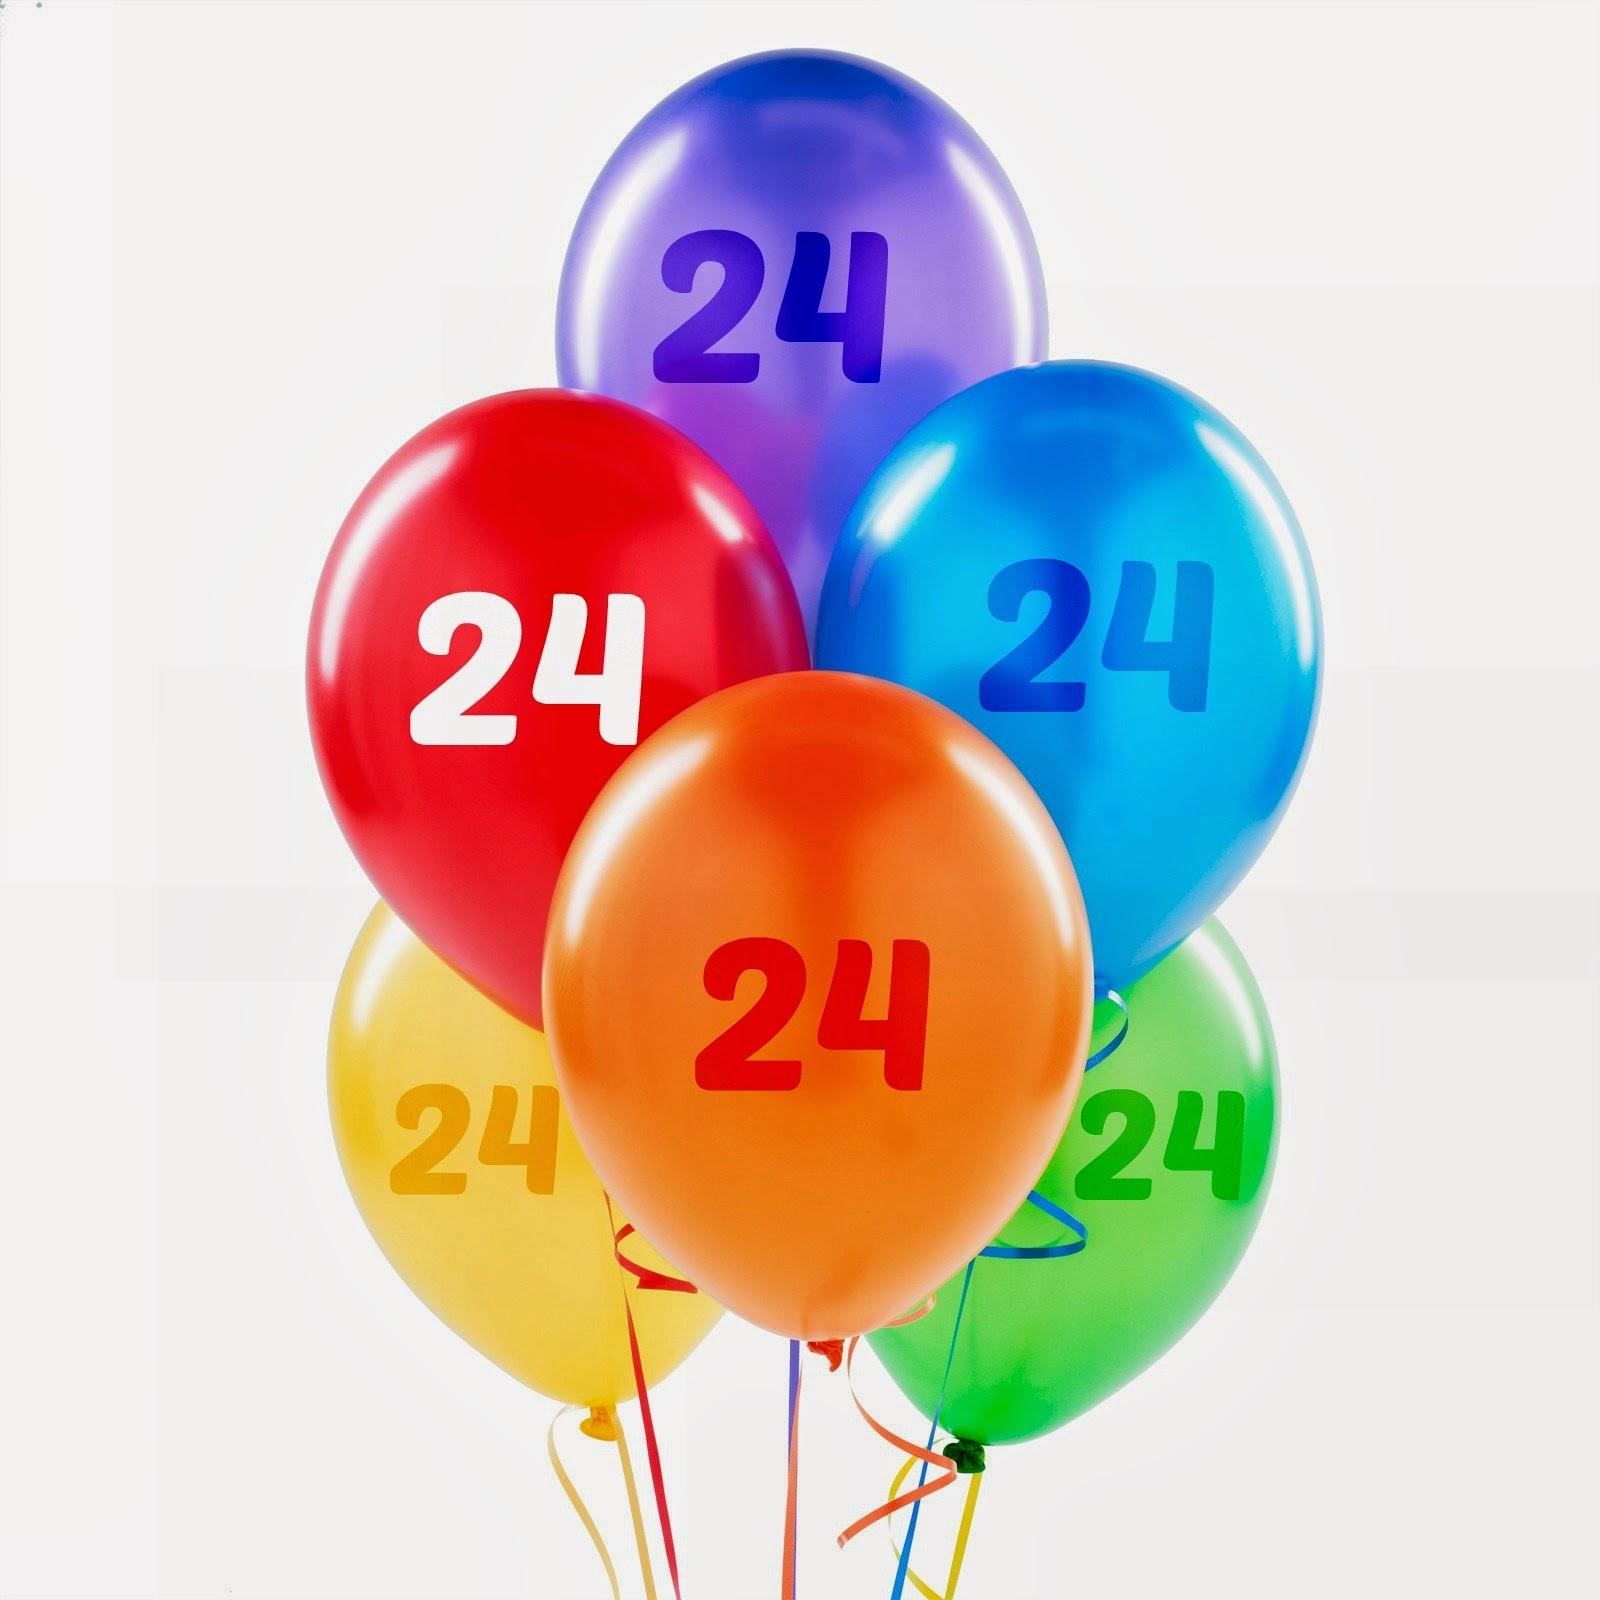 happy birthday 24 pablo zerpa feliz cumplea os numero 24 pablo zerpa. Black Bedroom Furniture Sets. Home Design Ideas